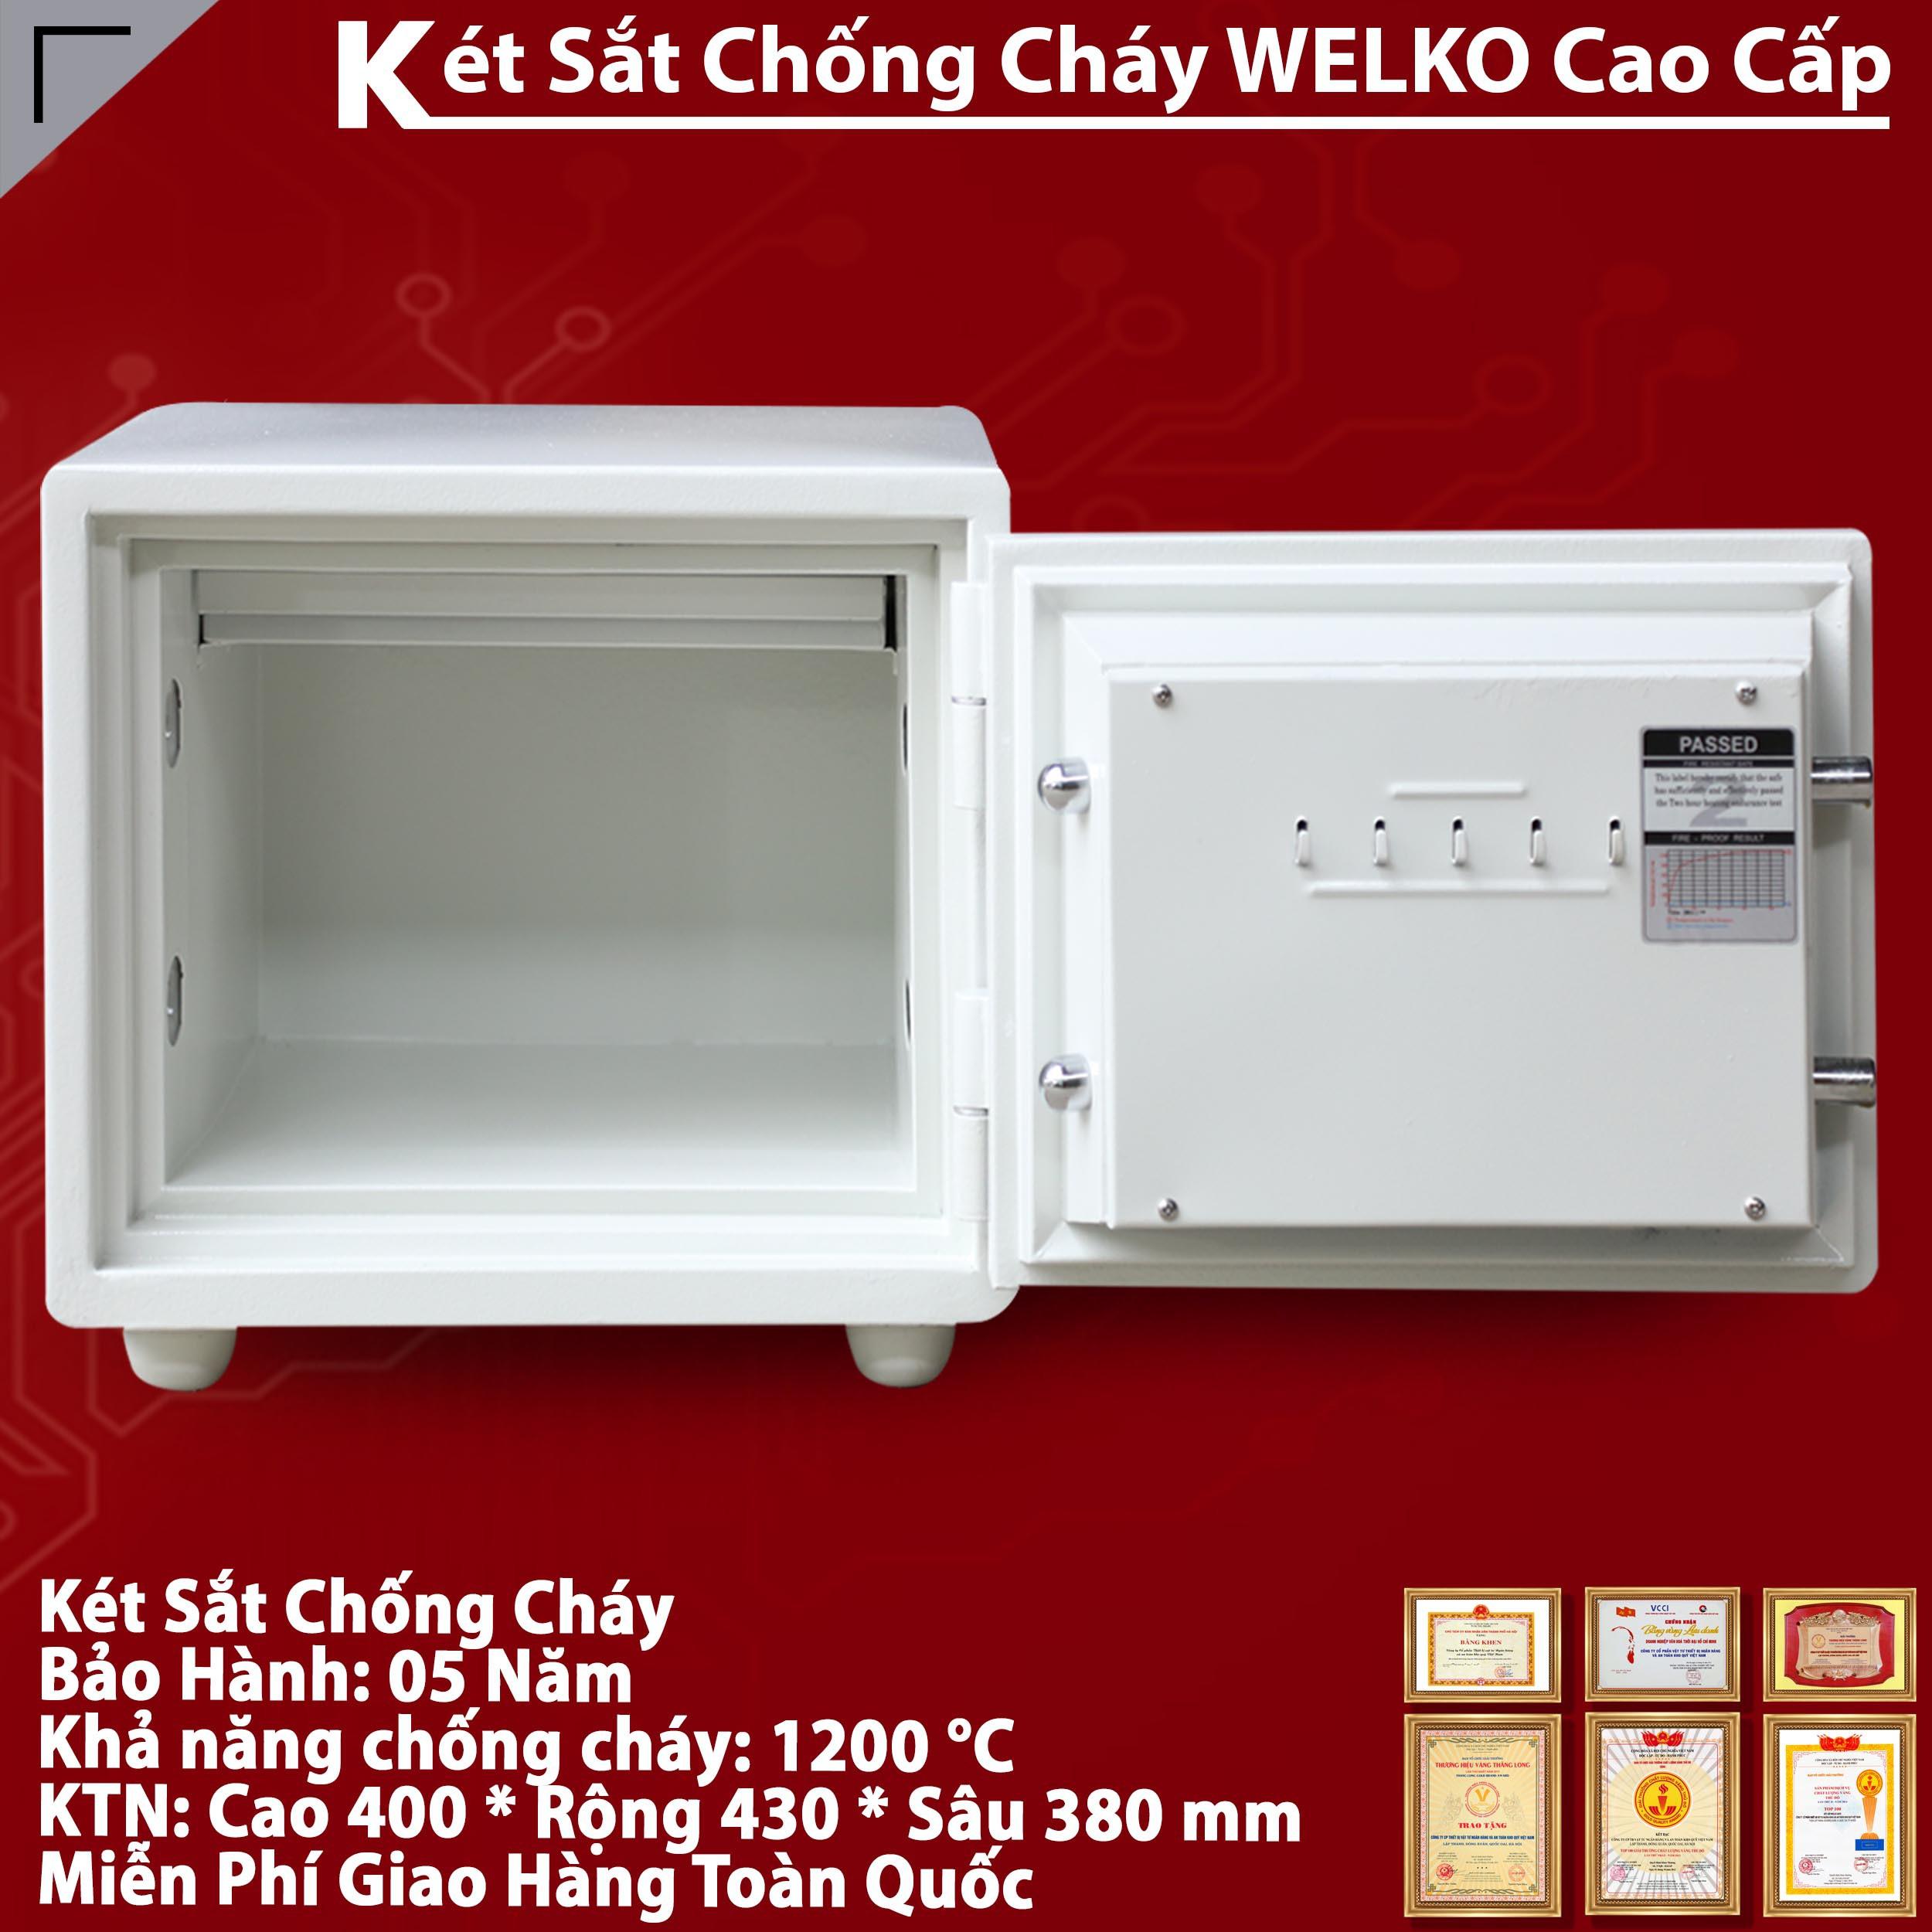 Ket Sat Chong Chay Welko Bao Mat Cao